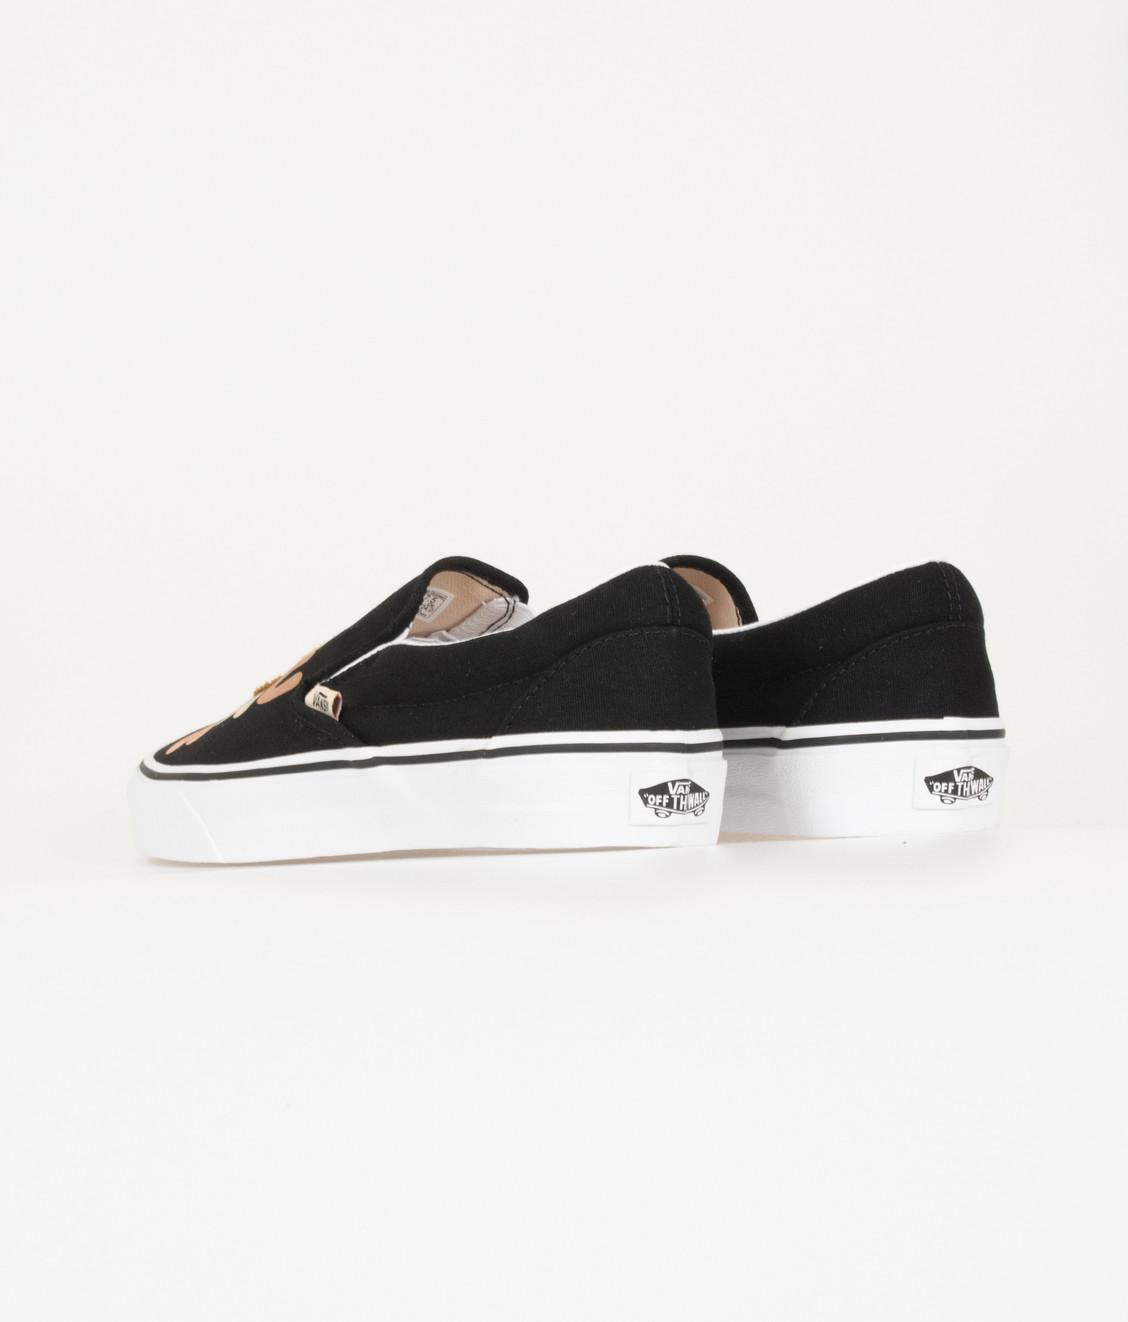 Vans Vans Classic Slip-On BCA Black